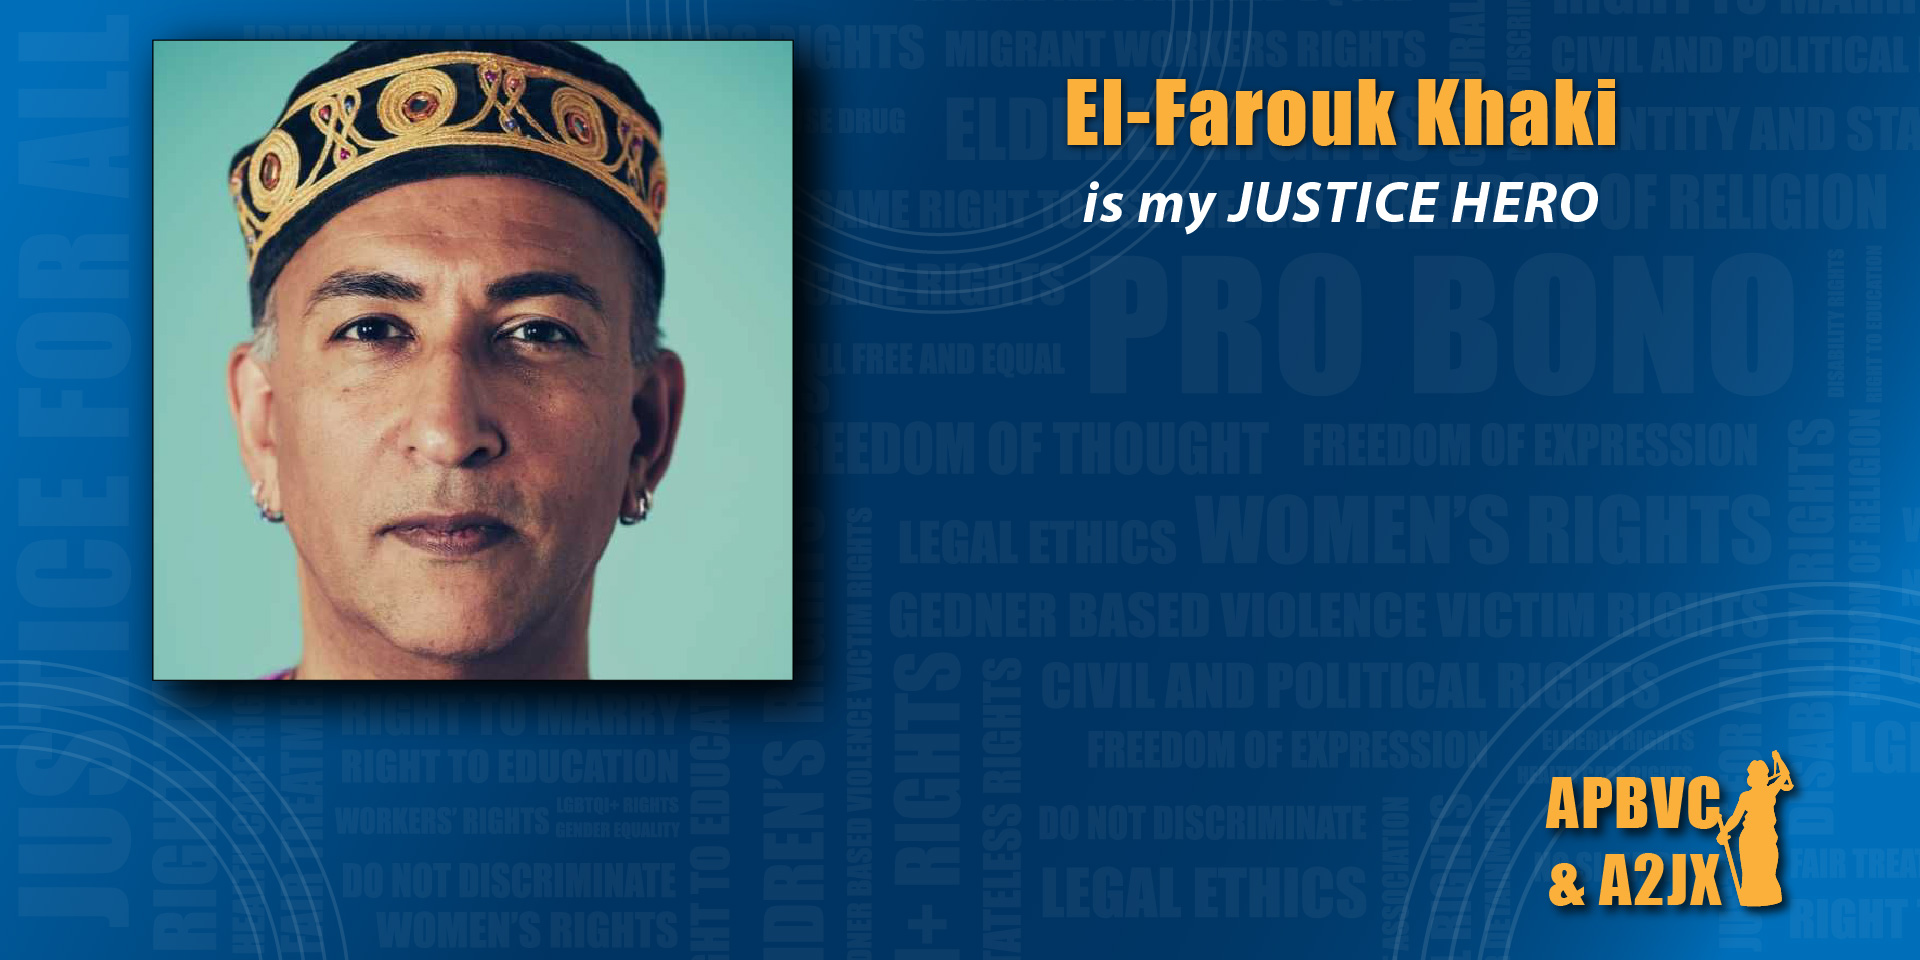 El-Farouk Khaki